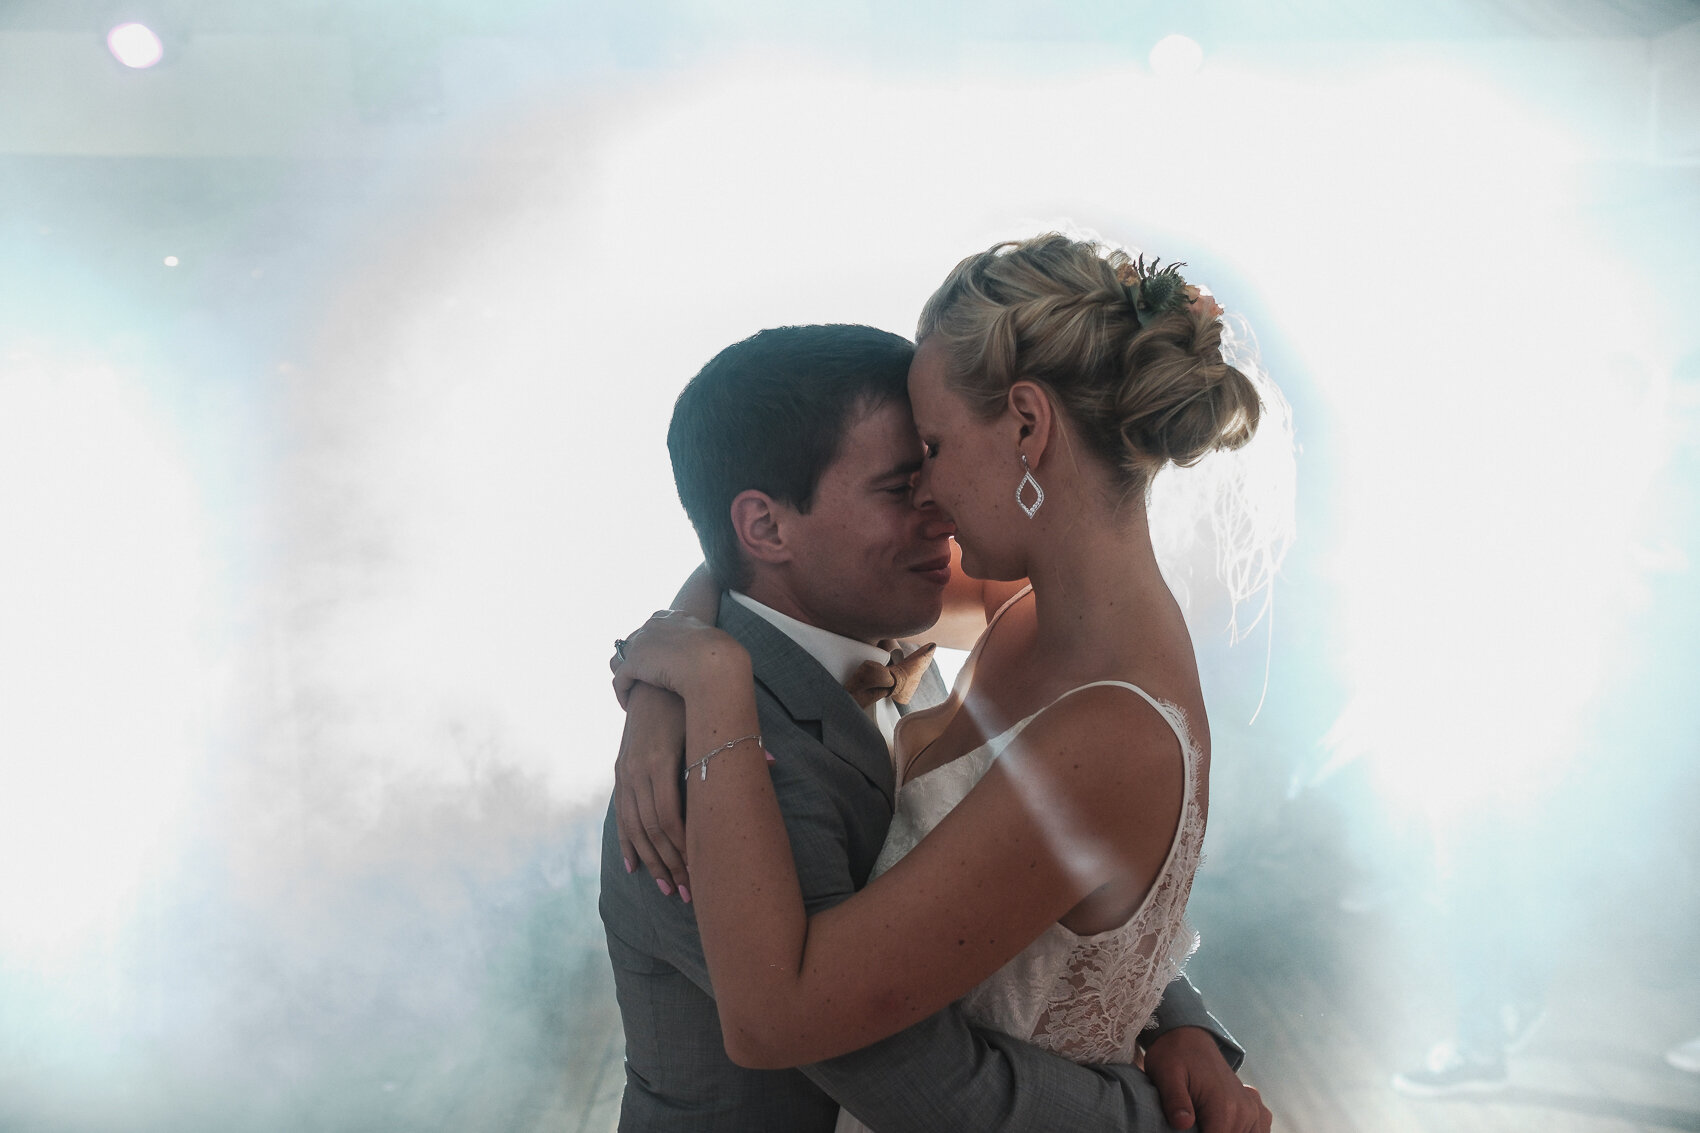 iso800 - huwelijksfotograaf isabo matthias verbeke foundation-36.jpg